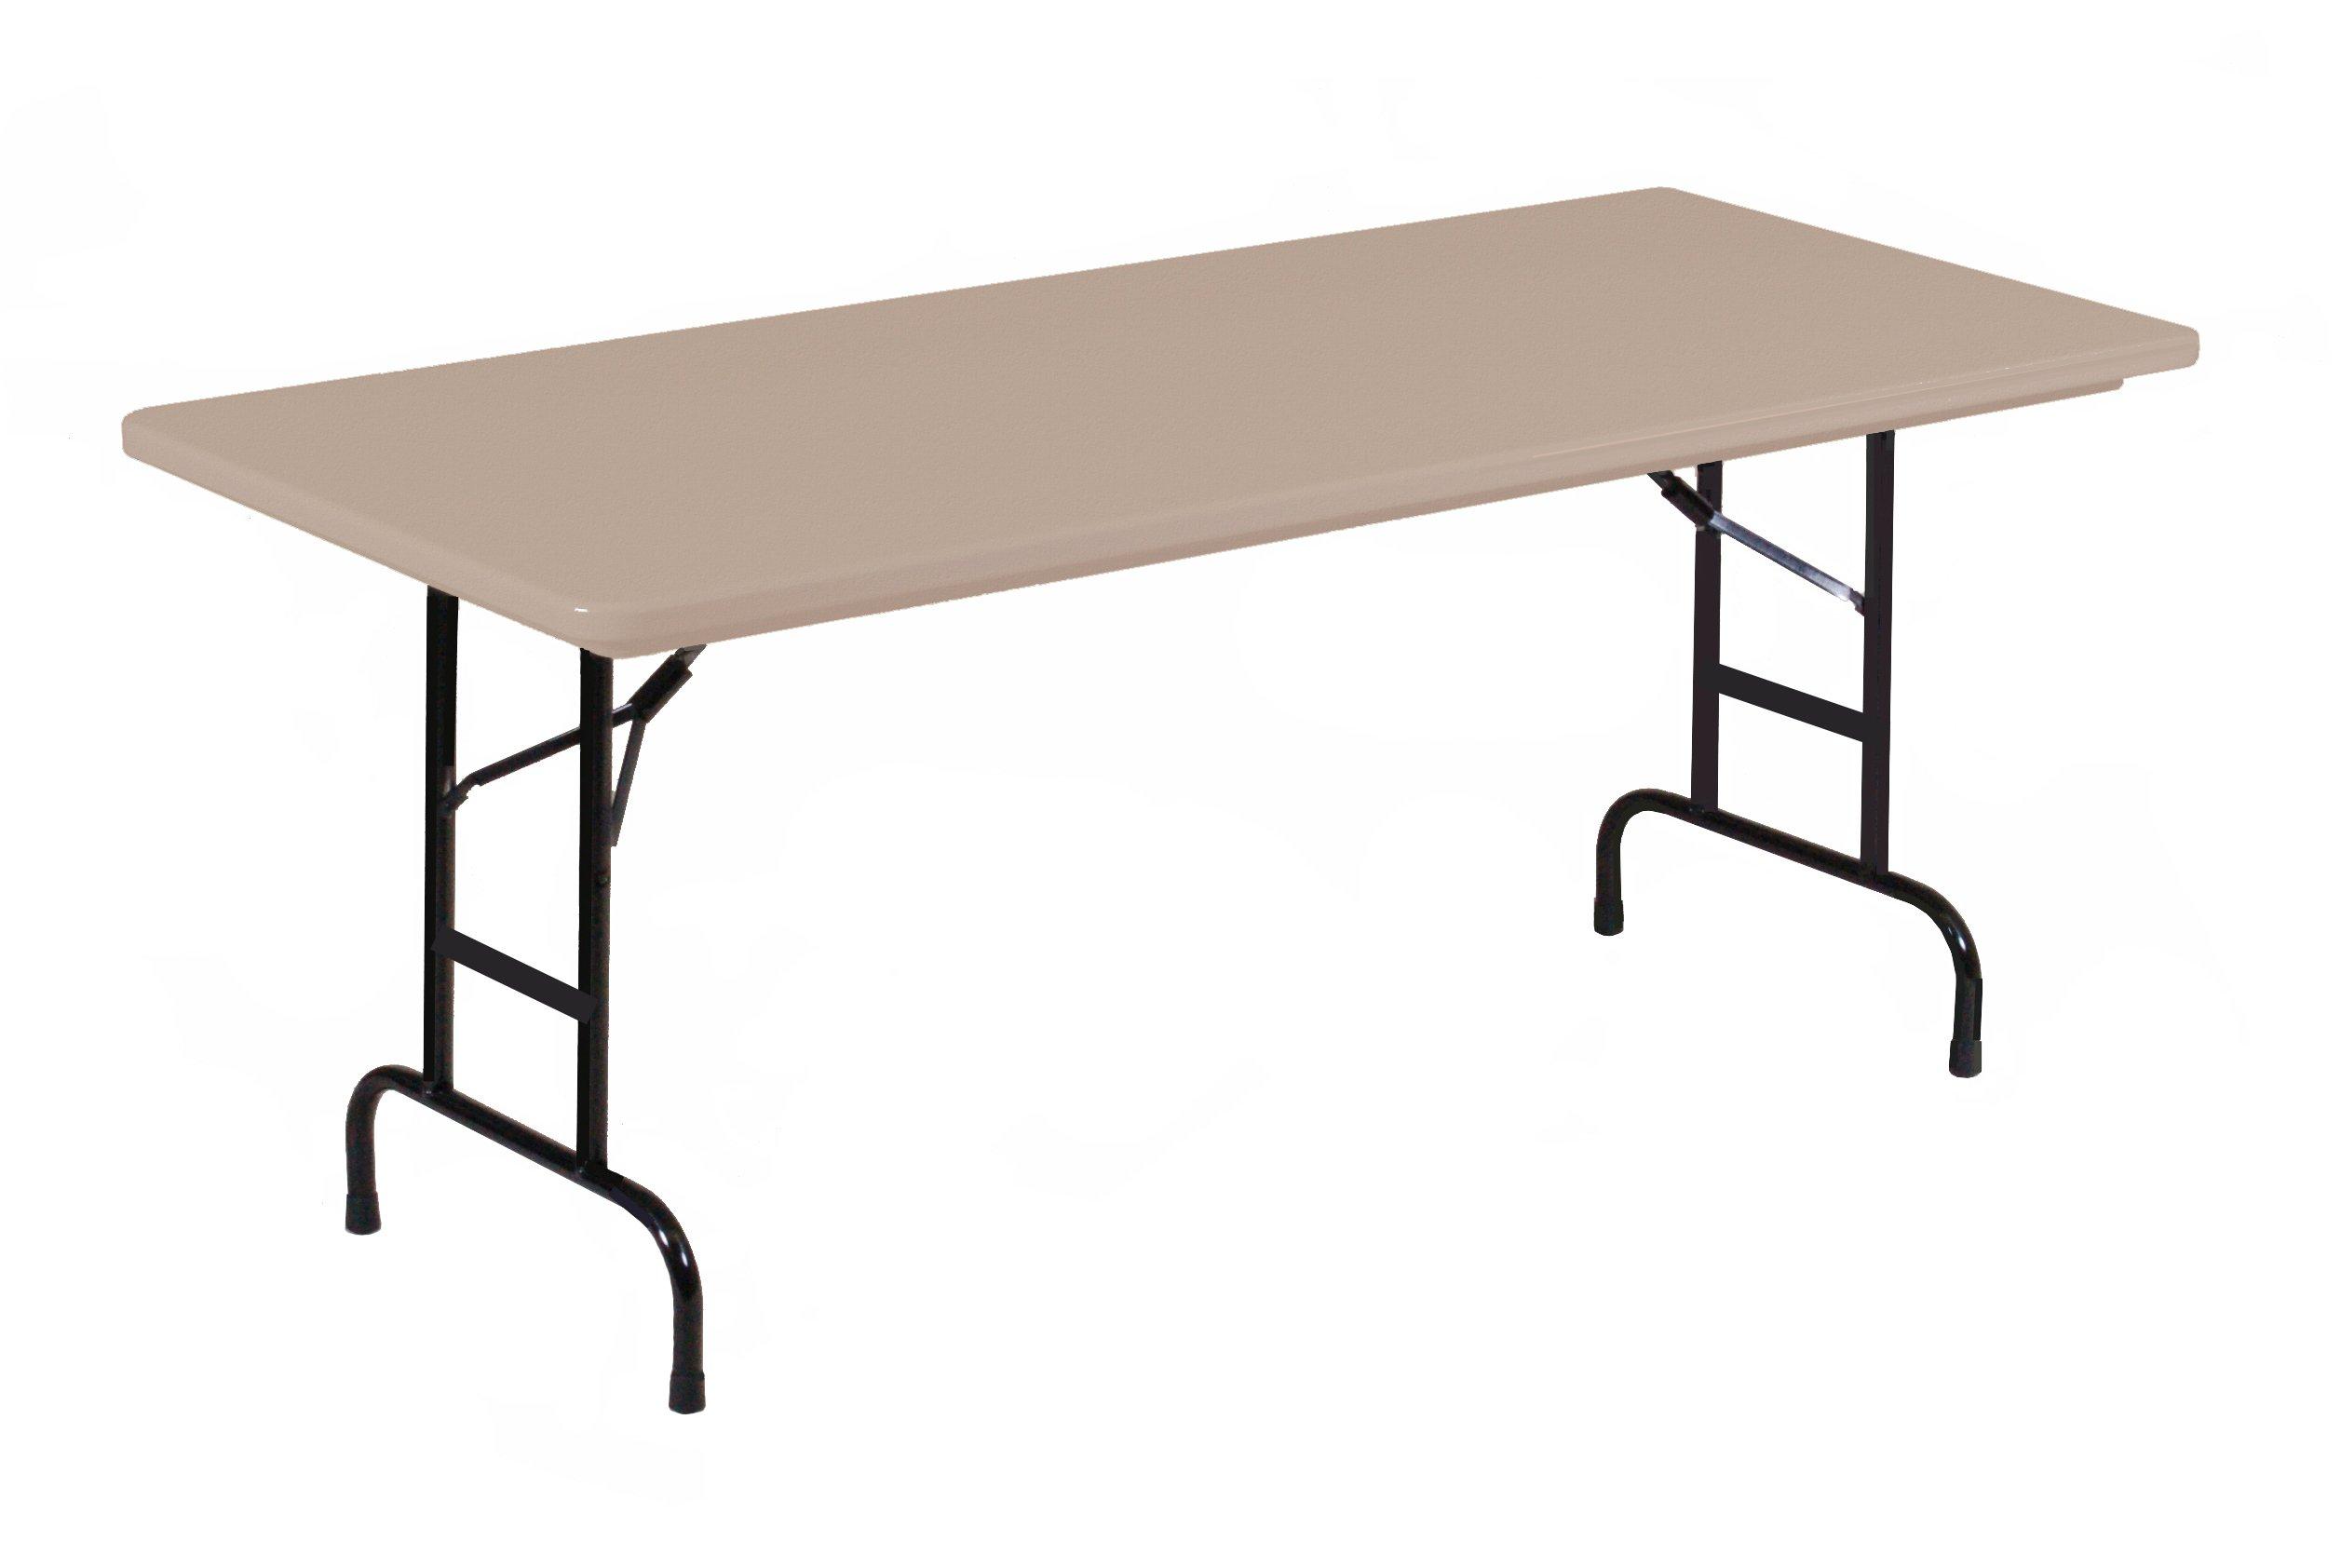 Correll RA3060-24 R Series, Adjustable Height Blow Molded Plastic Commercial Duty Folding Table, Rectangular, 30'' x 60'', Mocha Granite